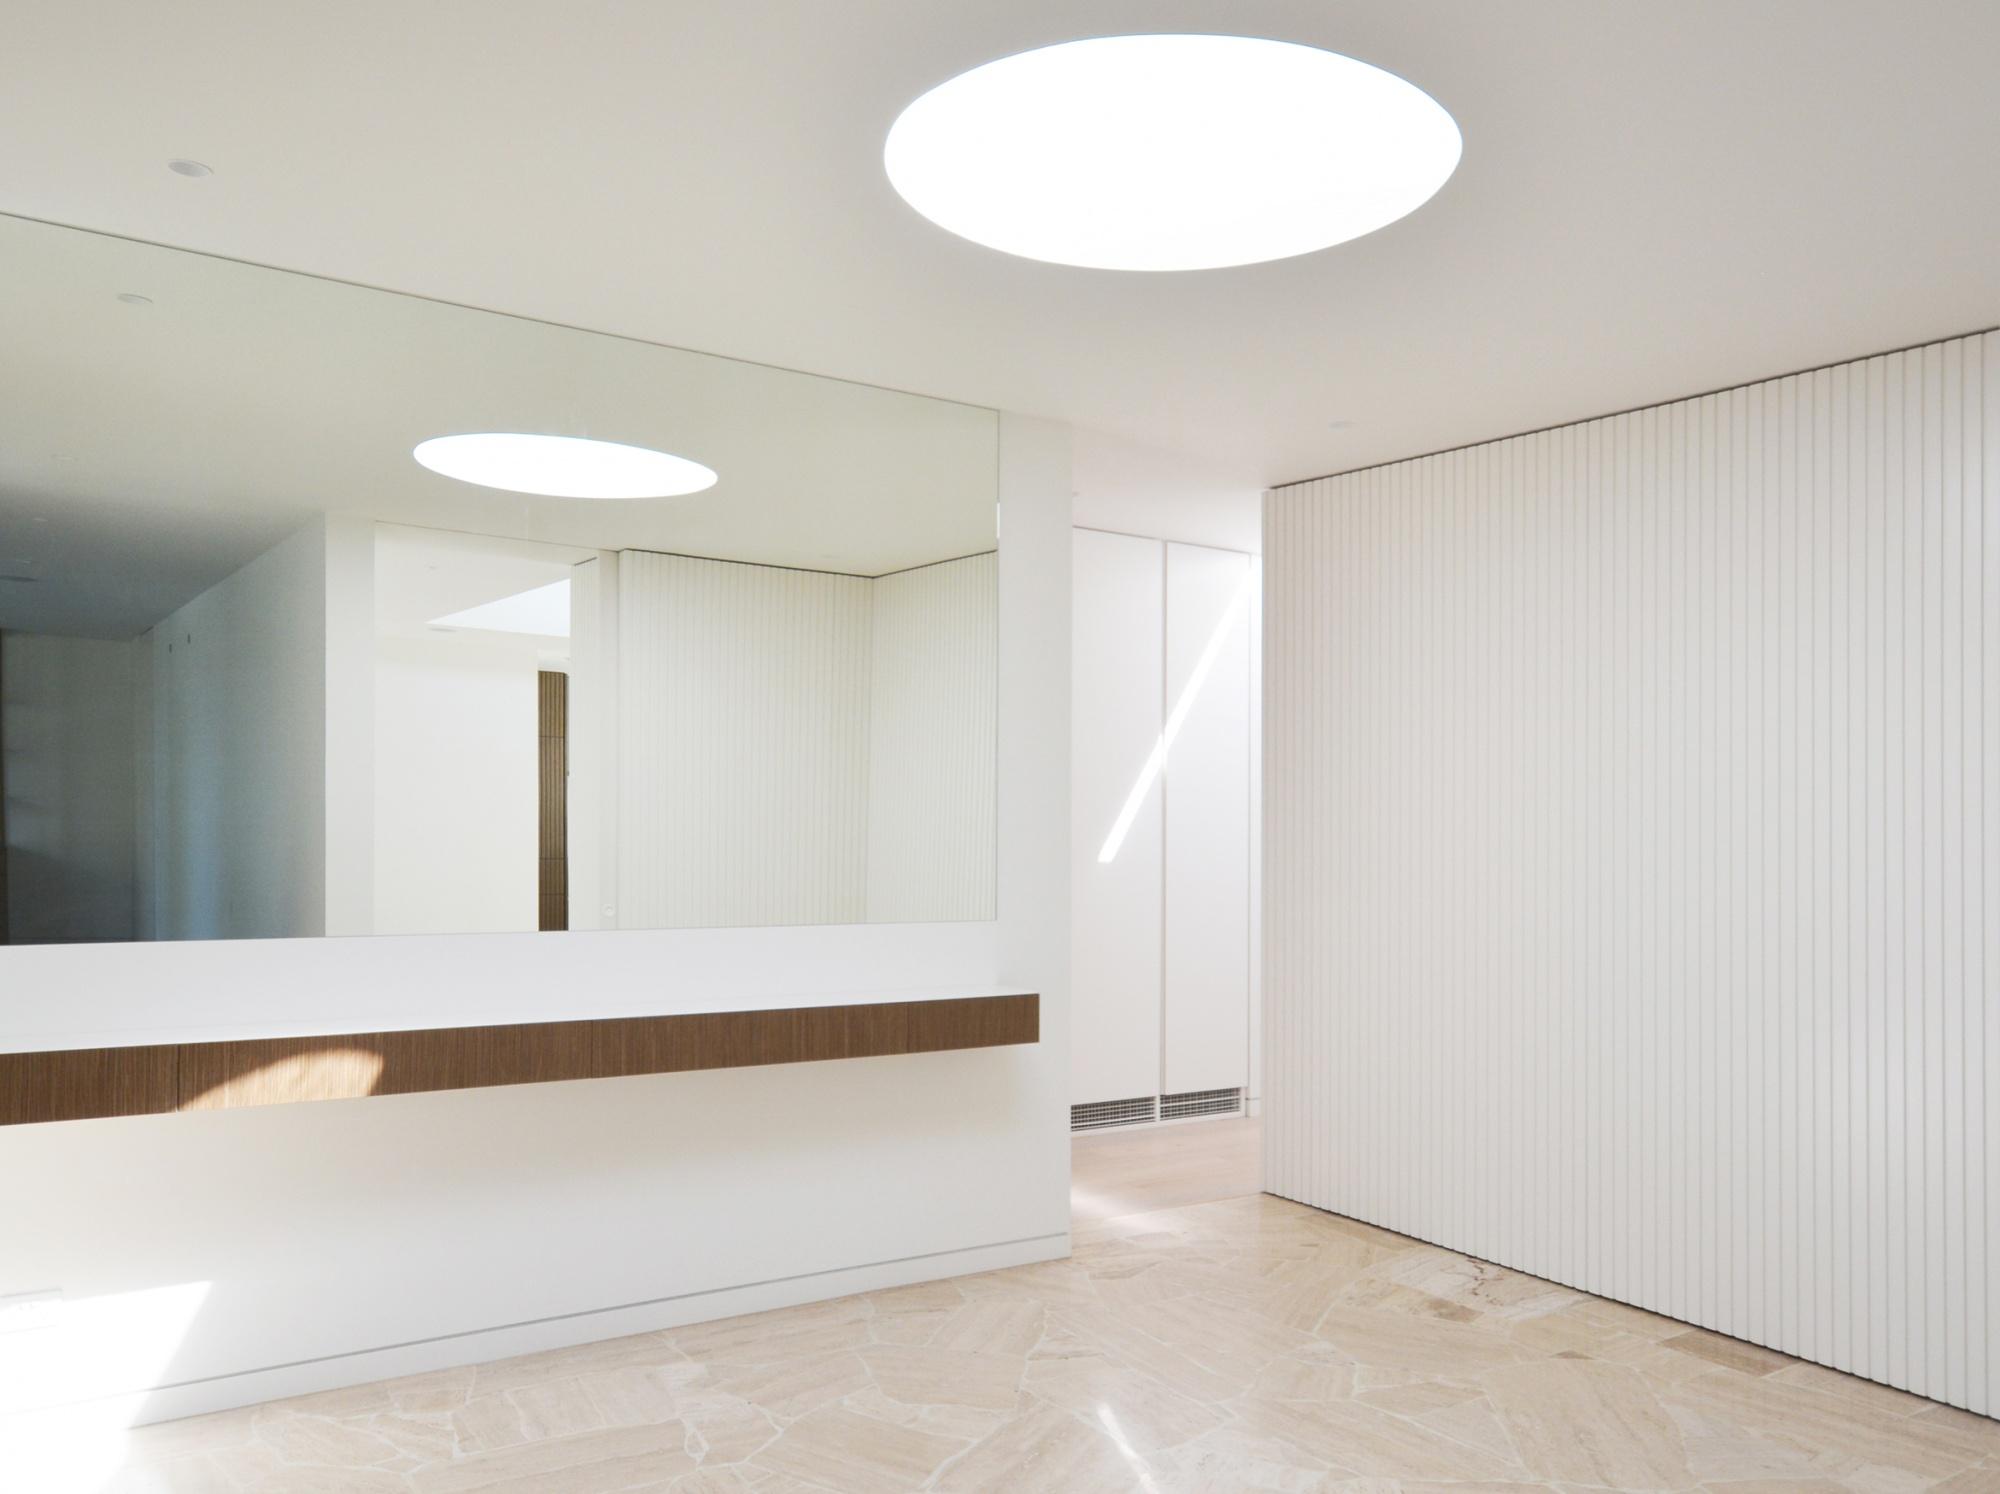 Mid Century Modern-Tecture-The Local Project-Australian Architecture & Design-Image 7